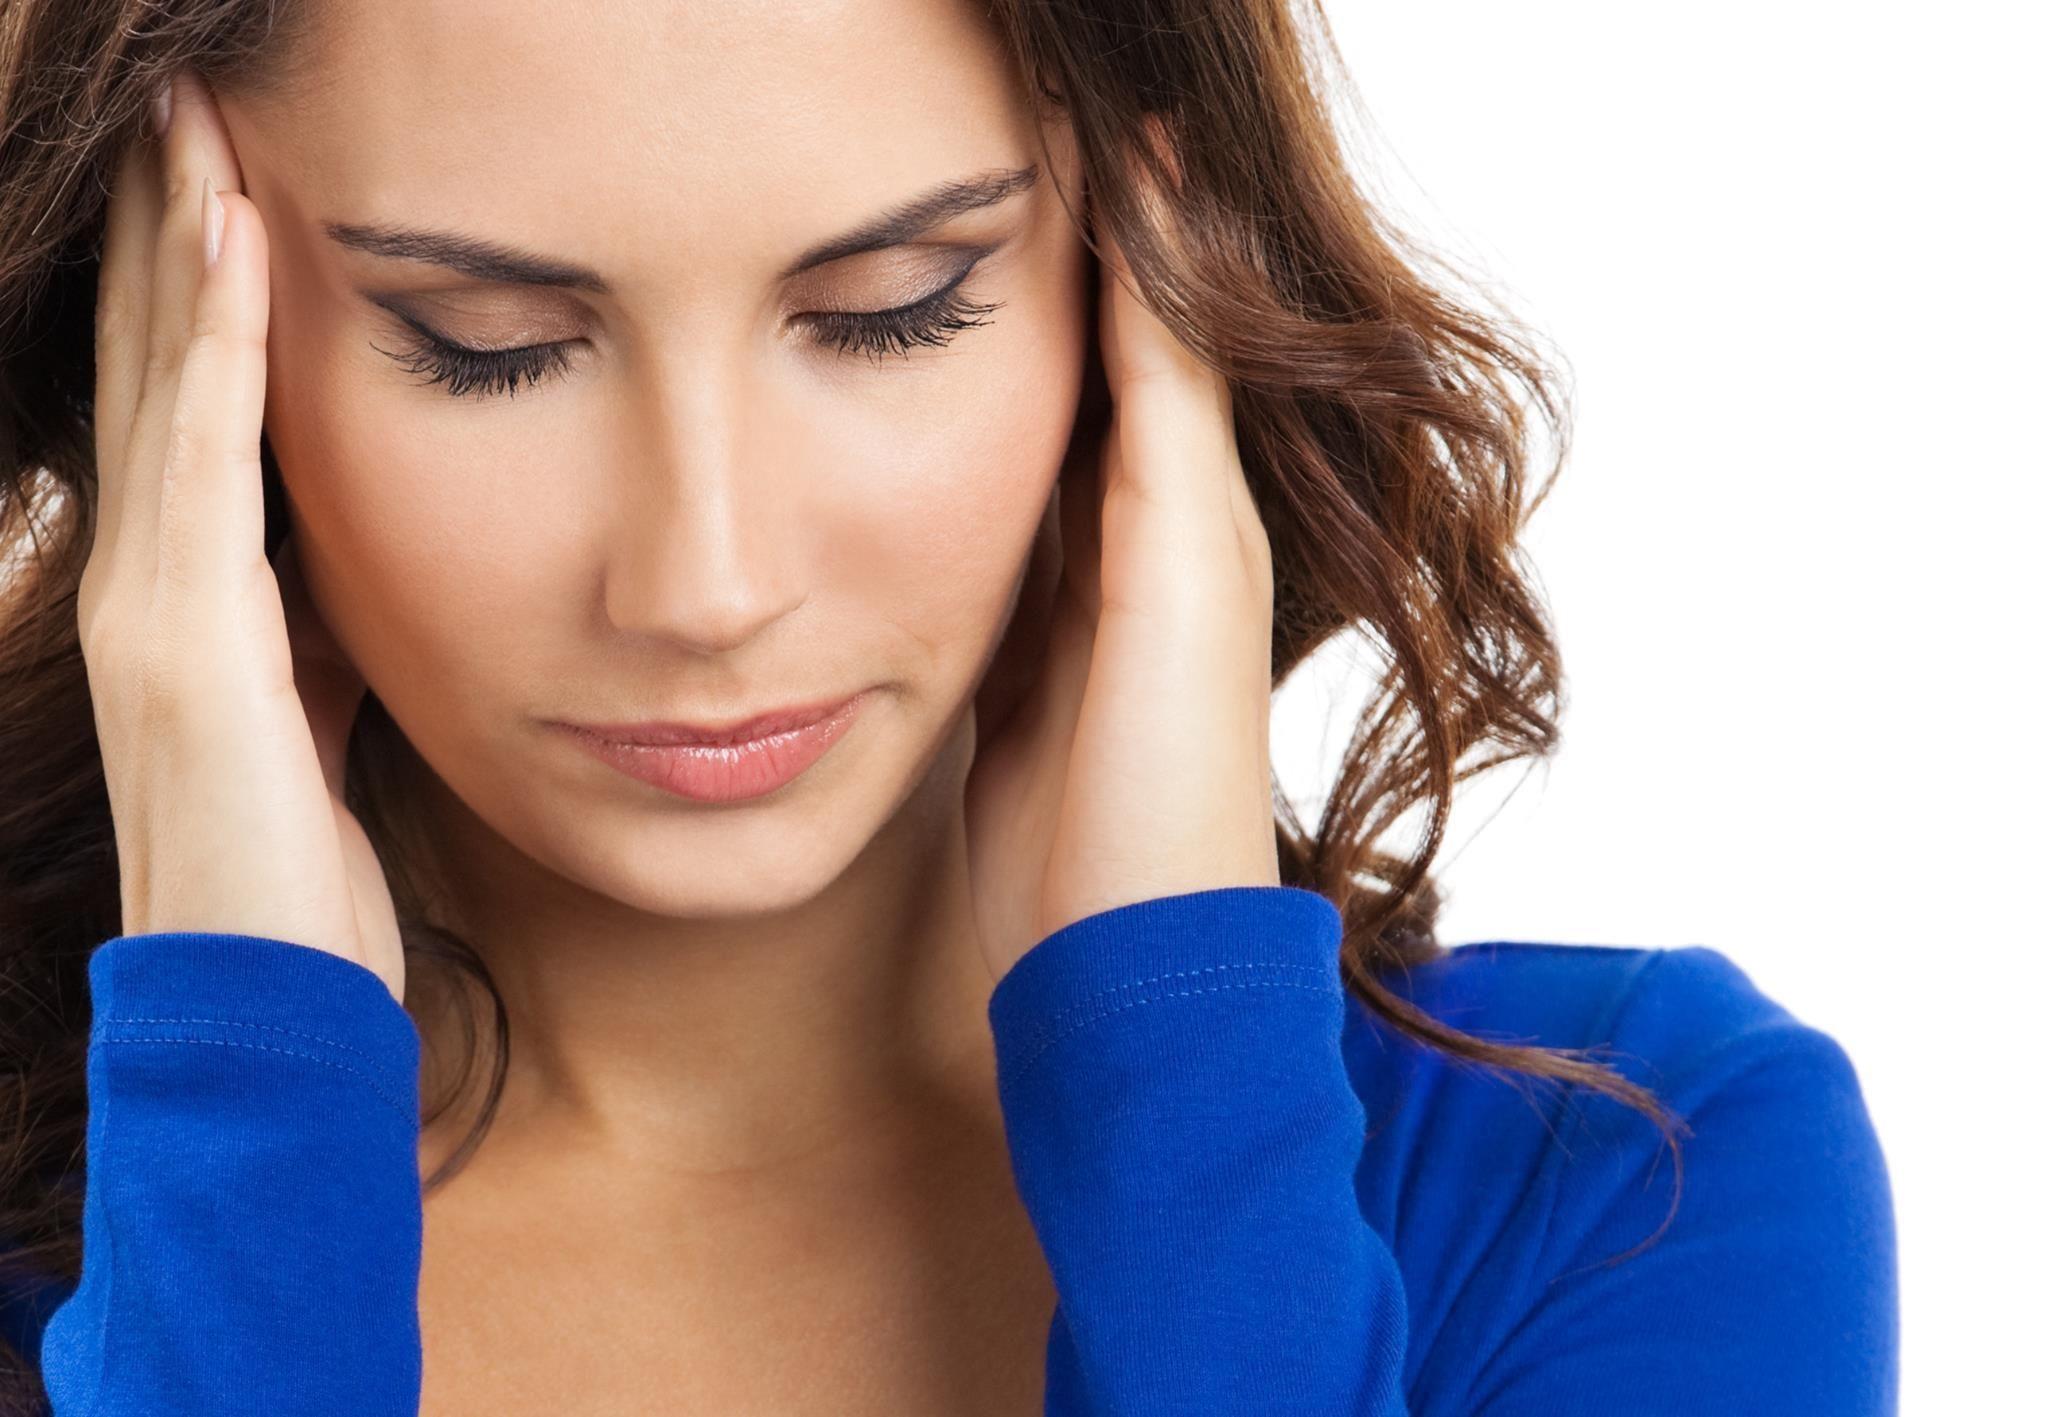 Cauze medicale care pot provoca transpiratiile nocturne | Medlife